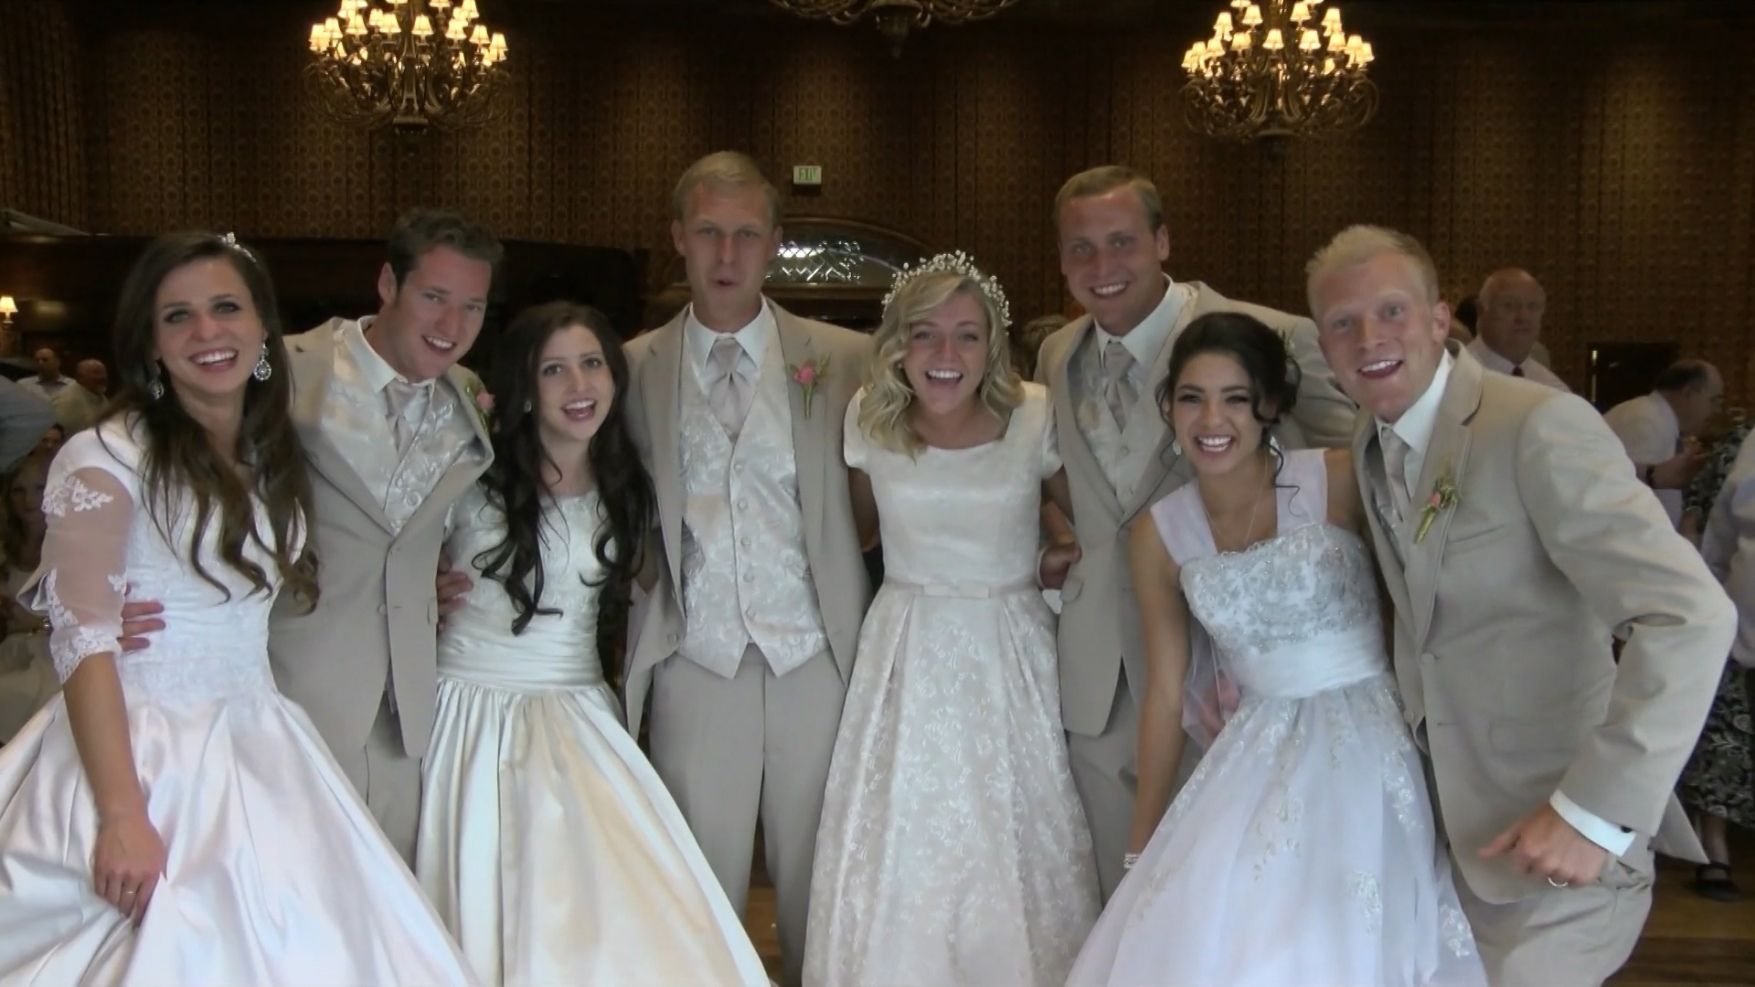 Ksl wedding dress  Pin by joanahairwedding on wedding ideas for you  Pinterest